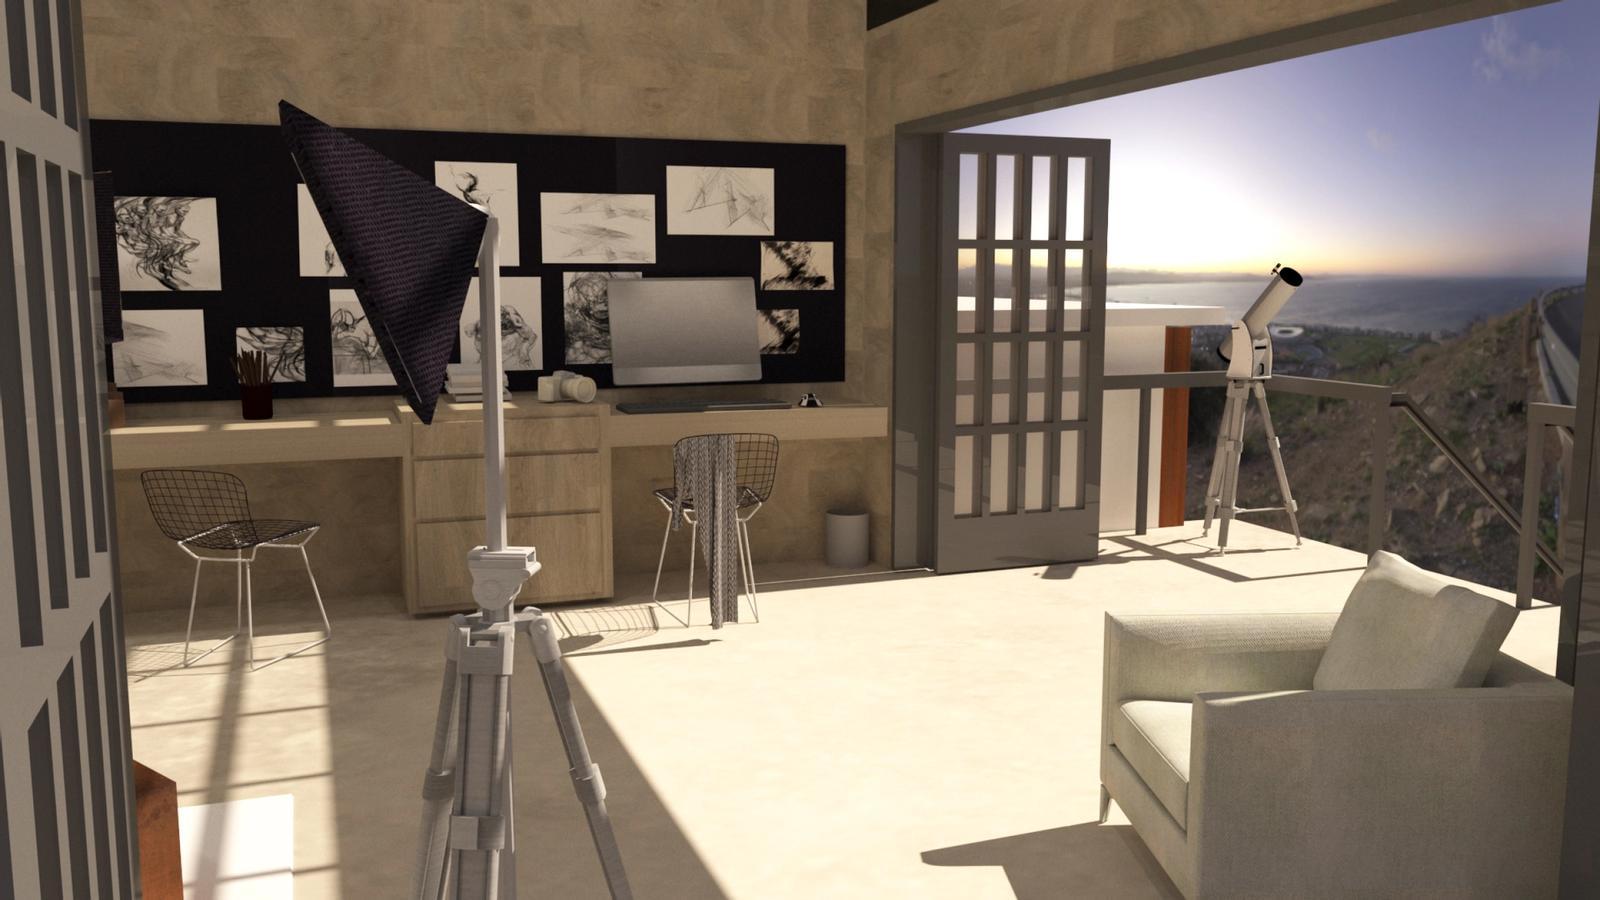 Artist Studio Loft - Studio in the Morning